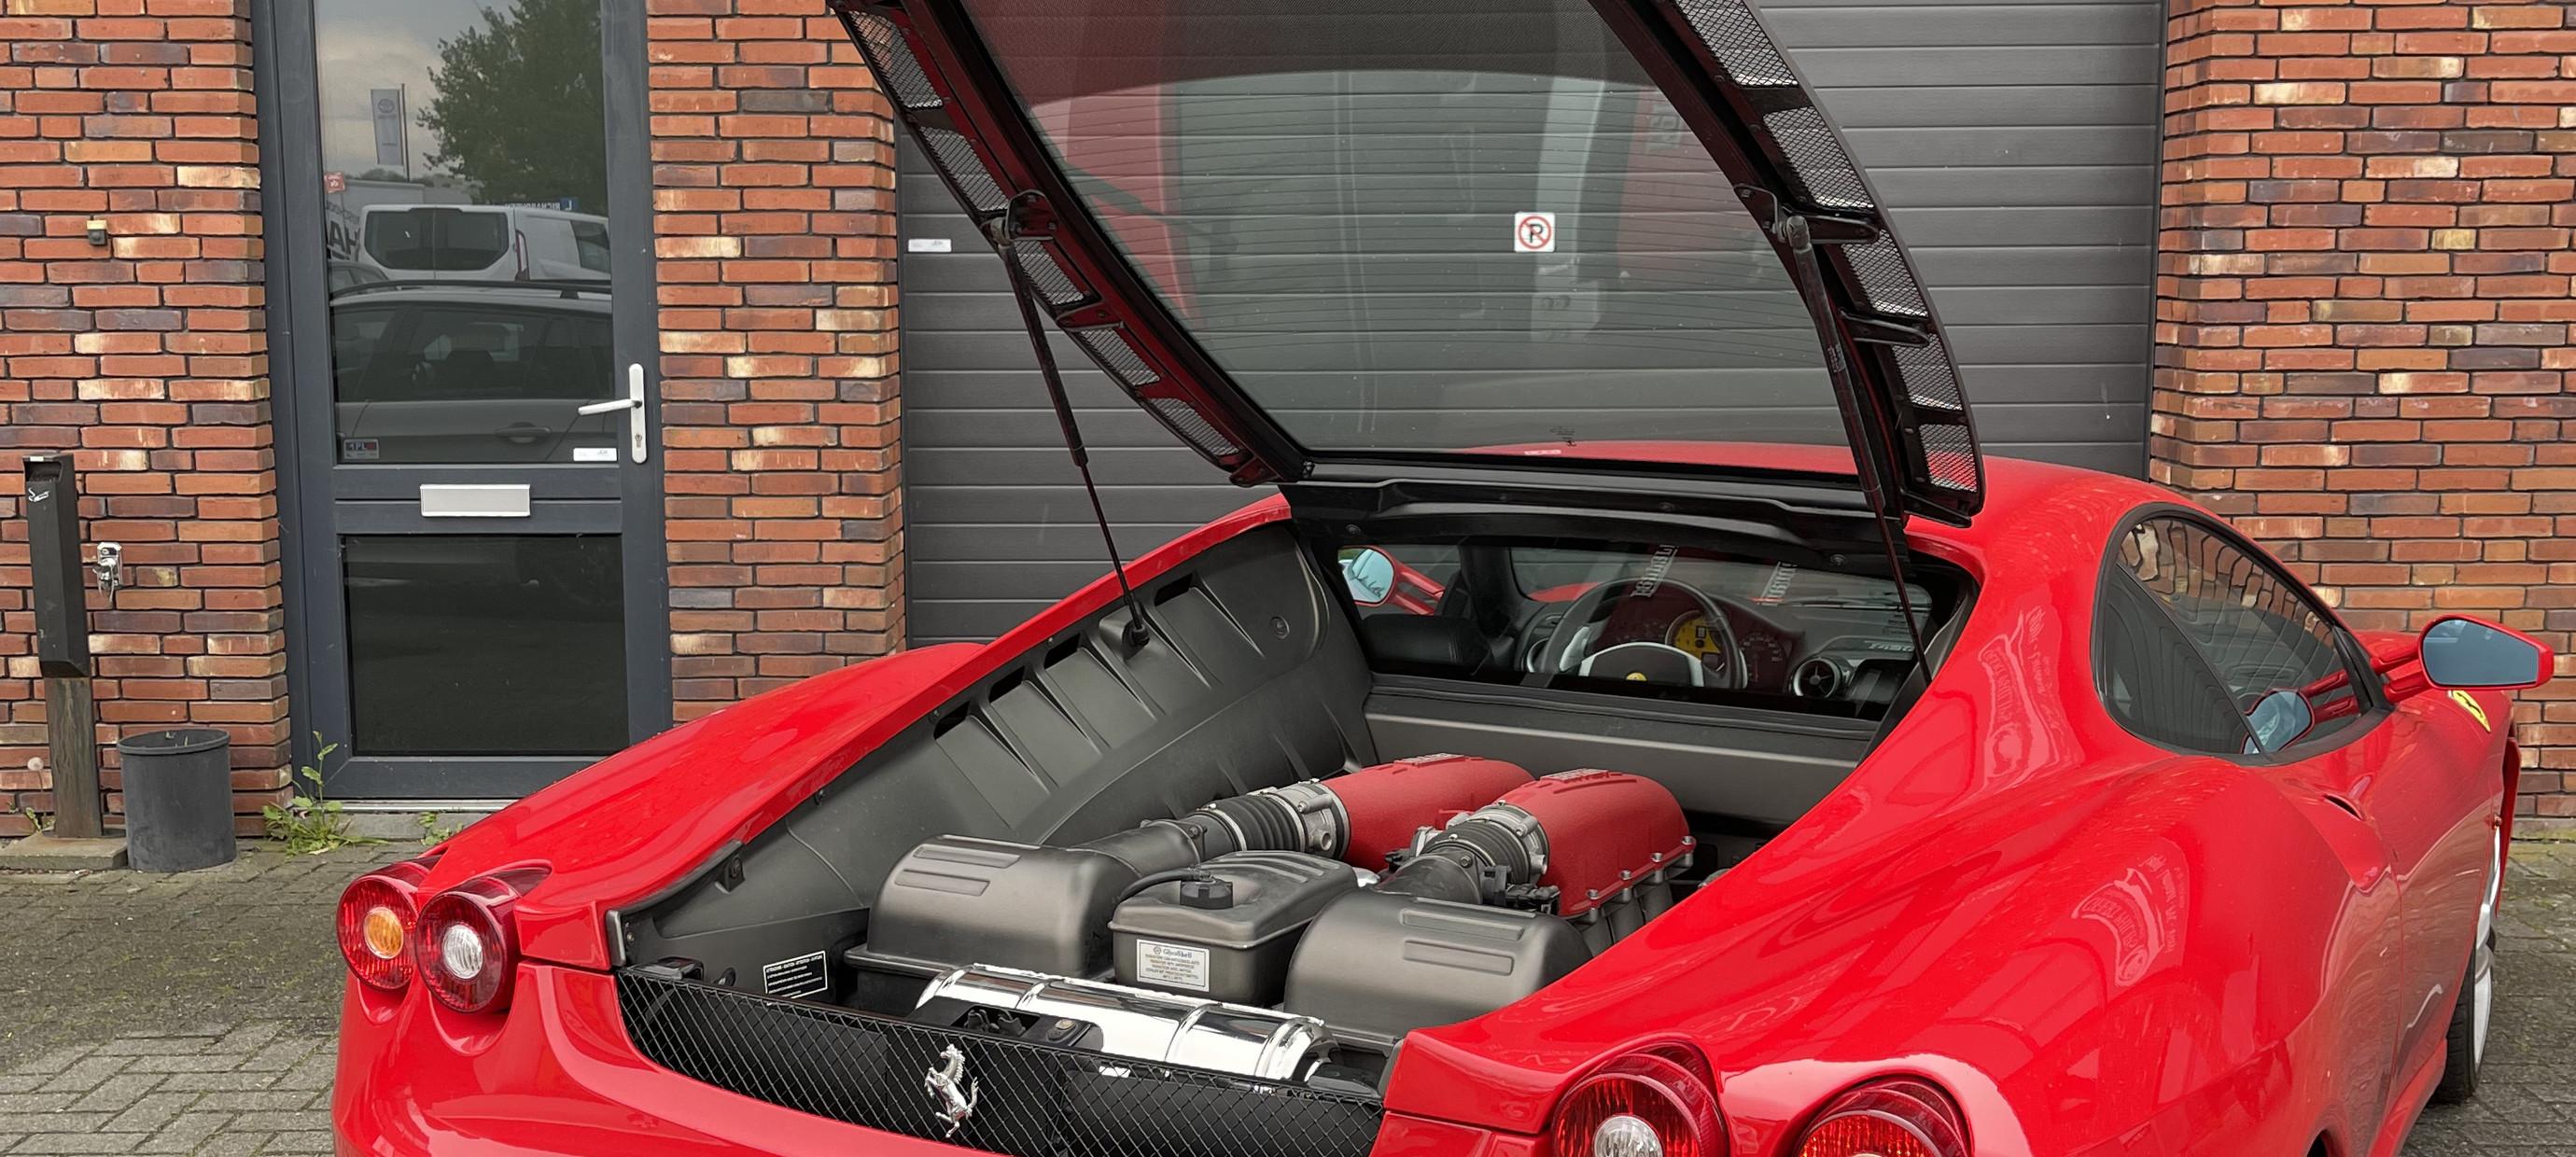 Ferrari F430 equipped with Capristo exhaust